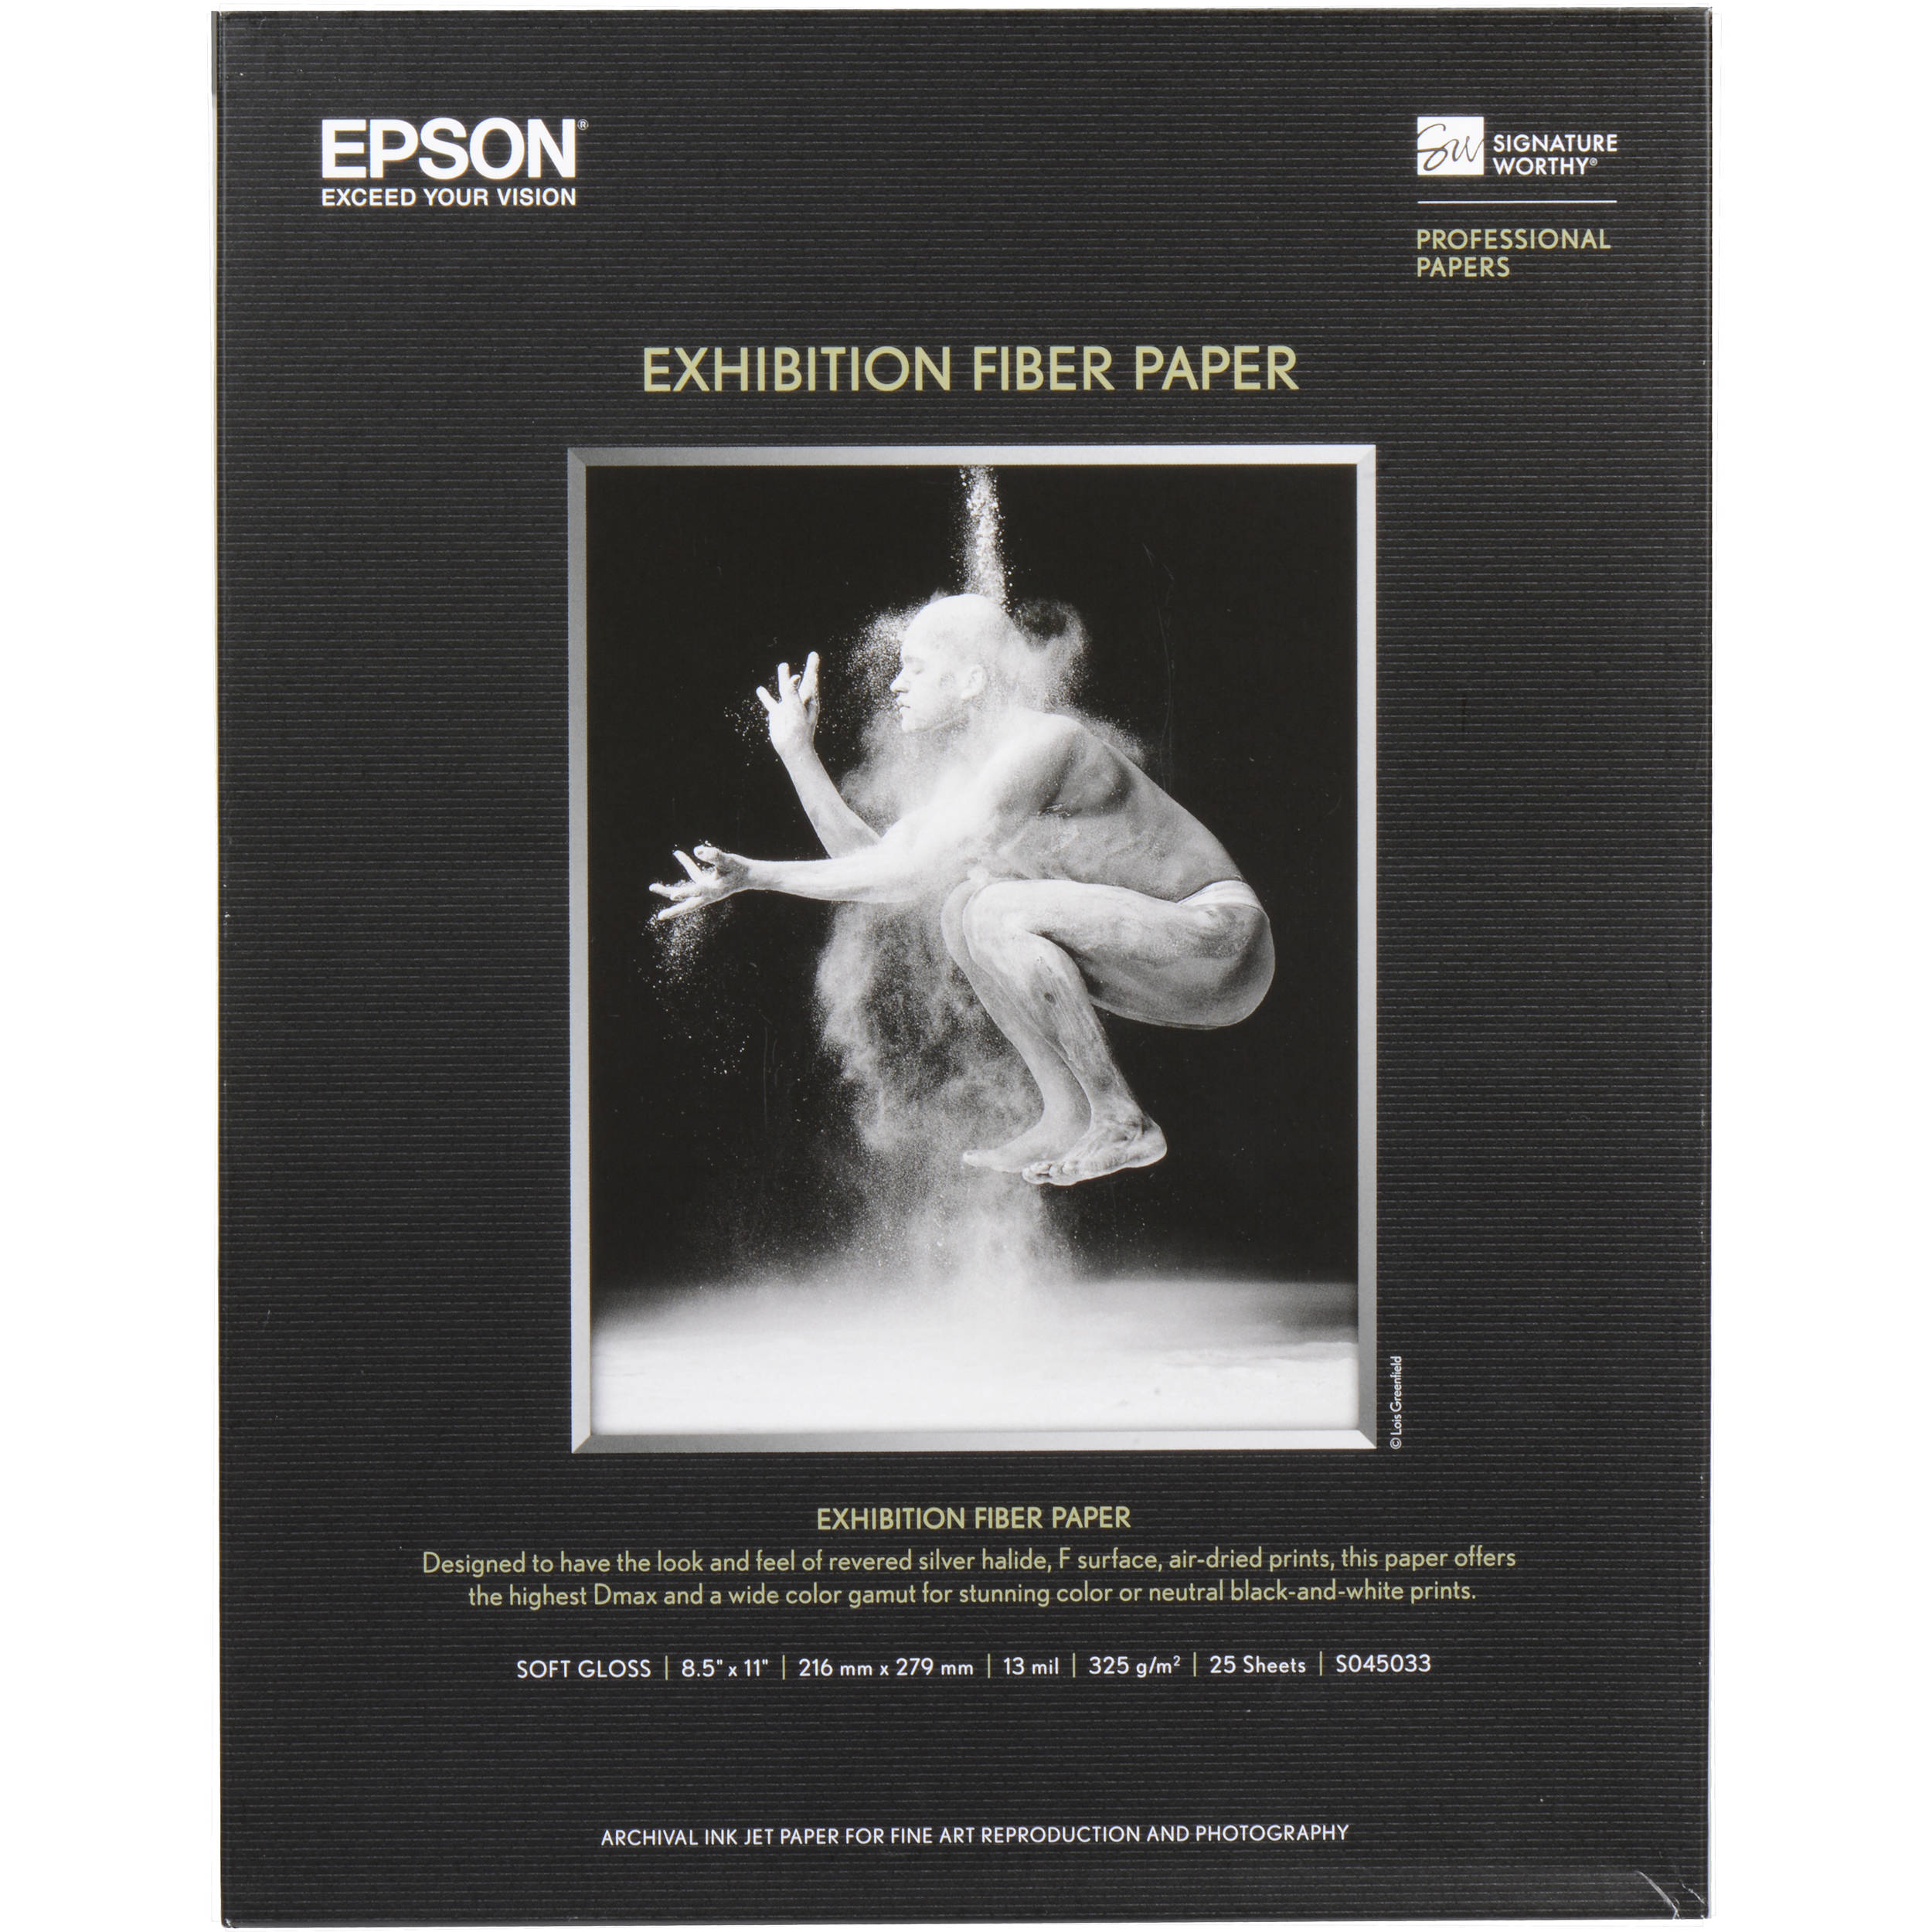 Epson Exhibition Fiber Paper (8 5 x 11